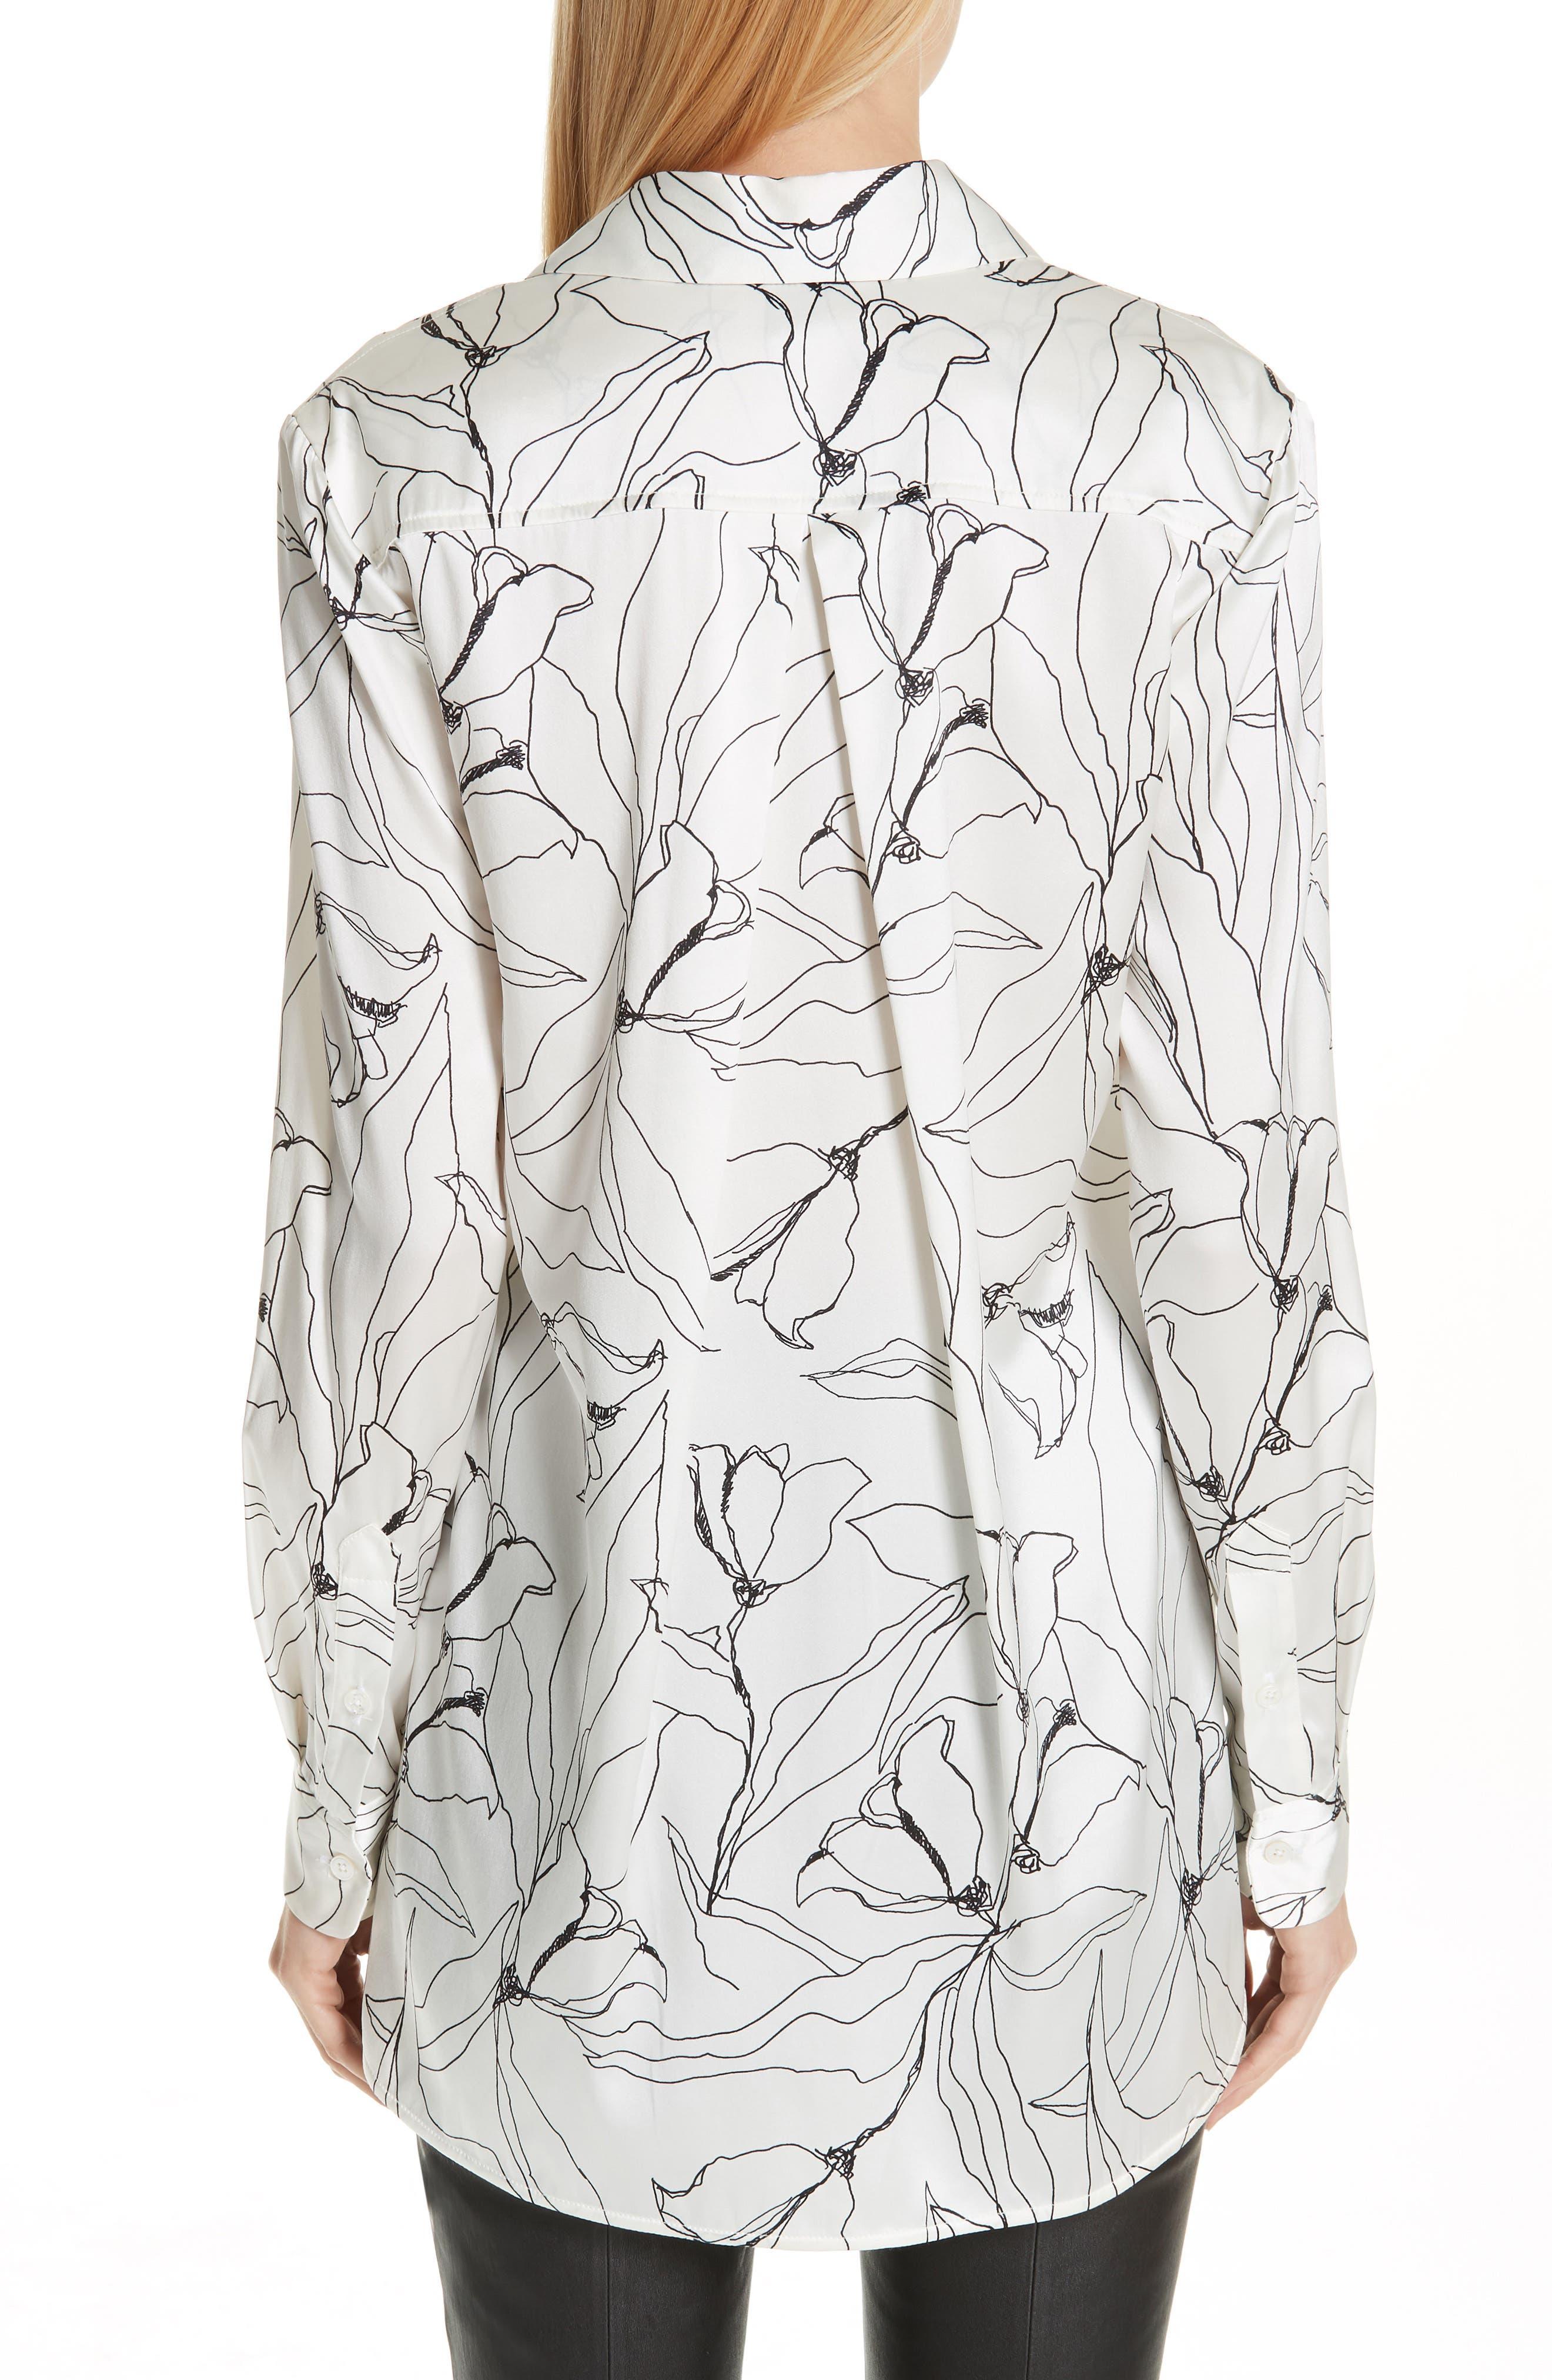 ST. JOHN COLLECTION,                             Artisanal Floral Stretch Silk Blouse,                             Alternate thumbnail 2, color,                             CREAM/ CAVIAR